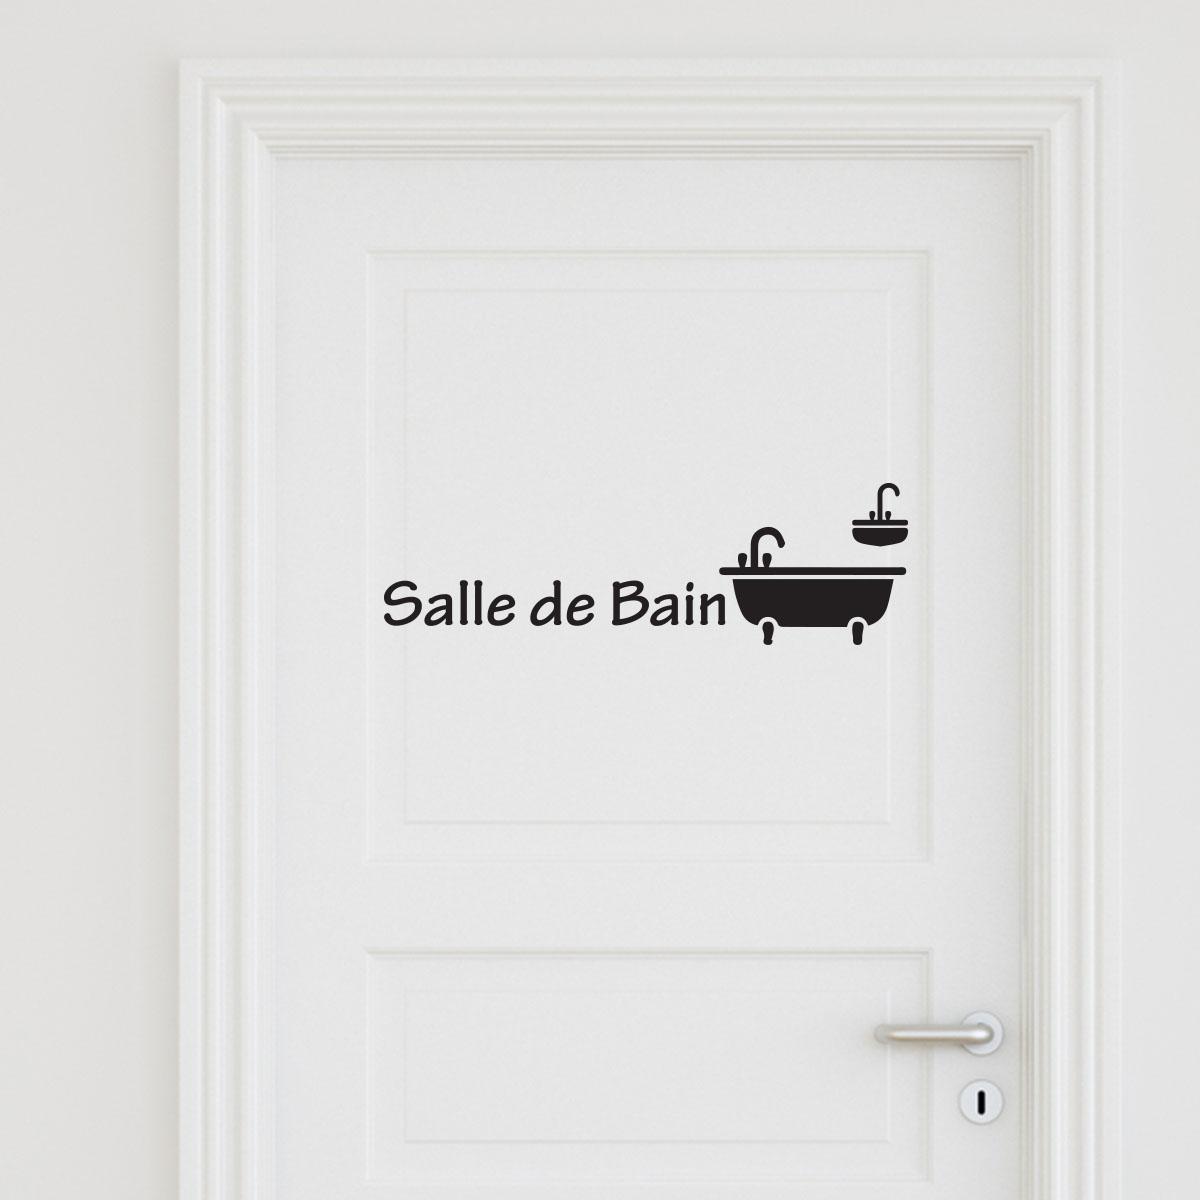 Sticker porte salle de bain 3 stickers stickers portes - Stickers pour carreaux salle de bain ...